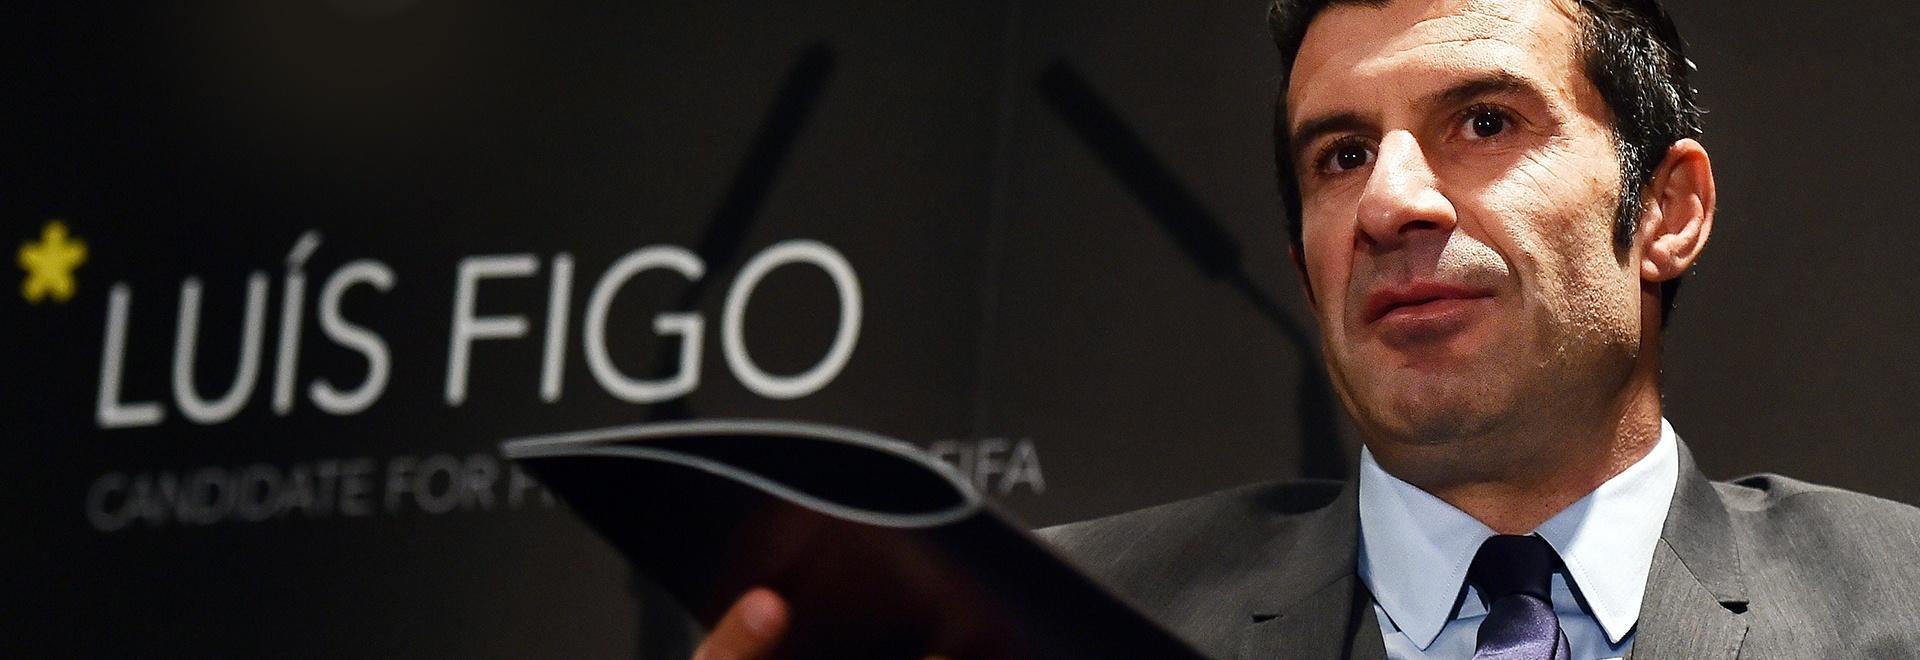 Luis Figo - L'intervista